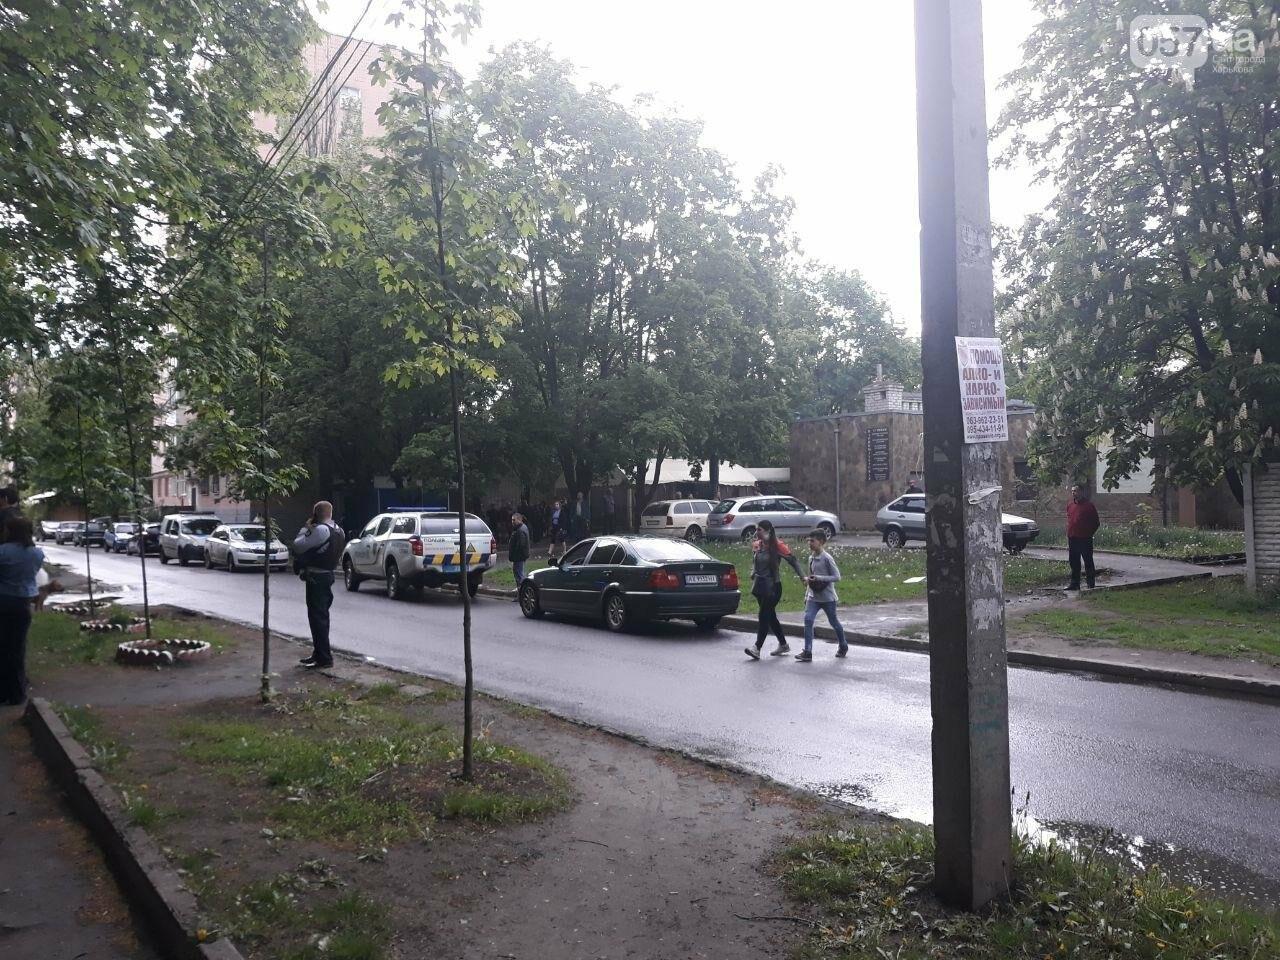 В Харькове силовики оцепили «пятиэтажку» и искали взрывчатку, - ФОТО, фото-4